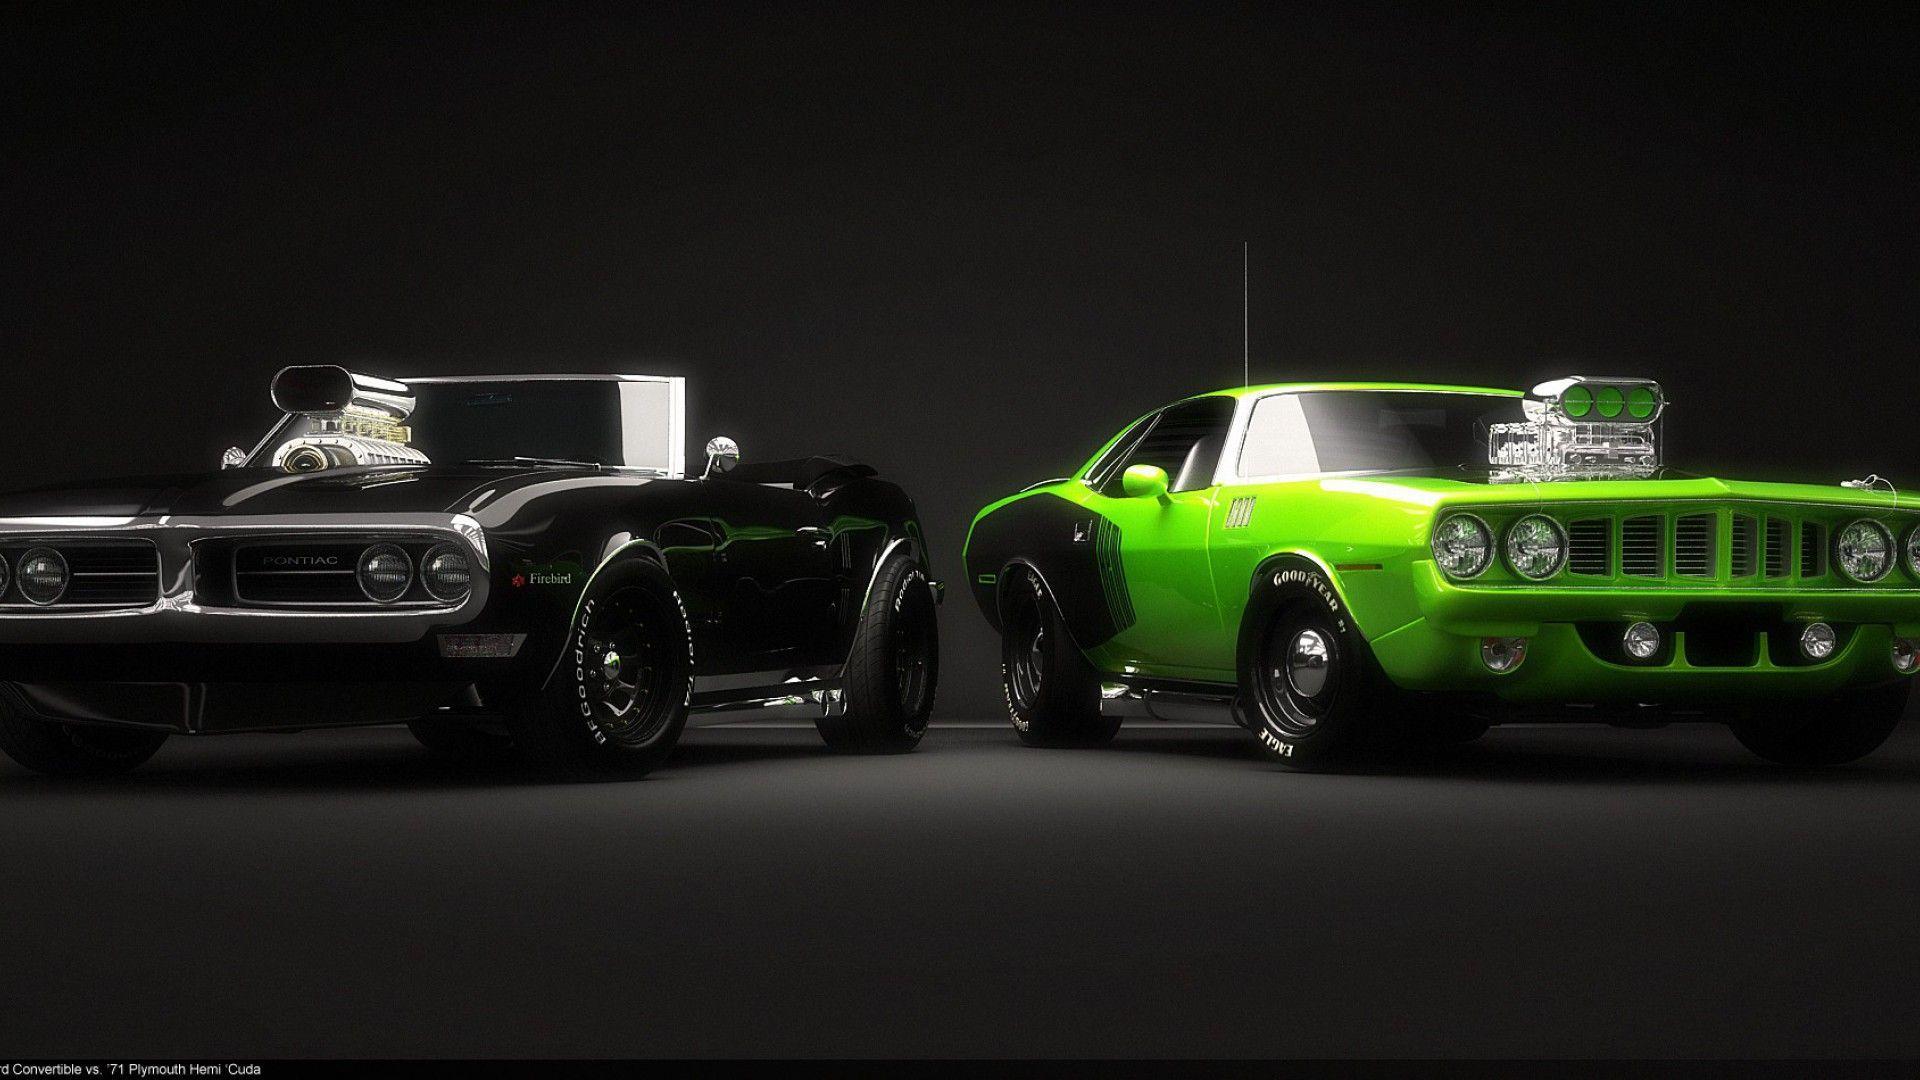 Black Car Hd Wallpapers Top Free Black Car Hd Backgrounds